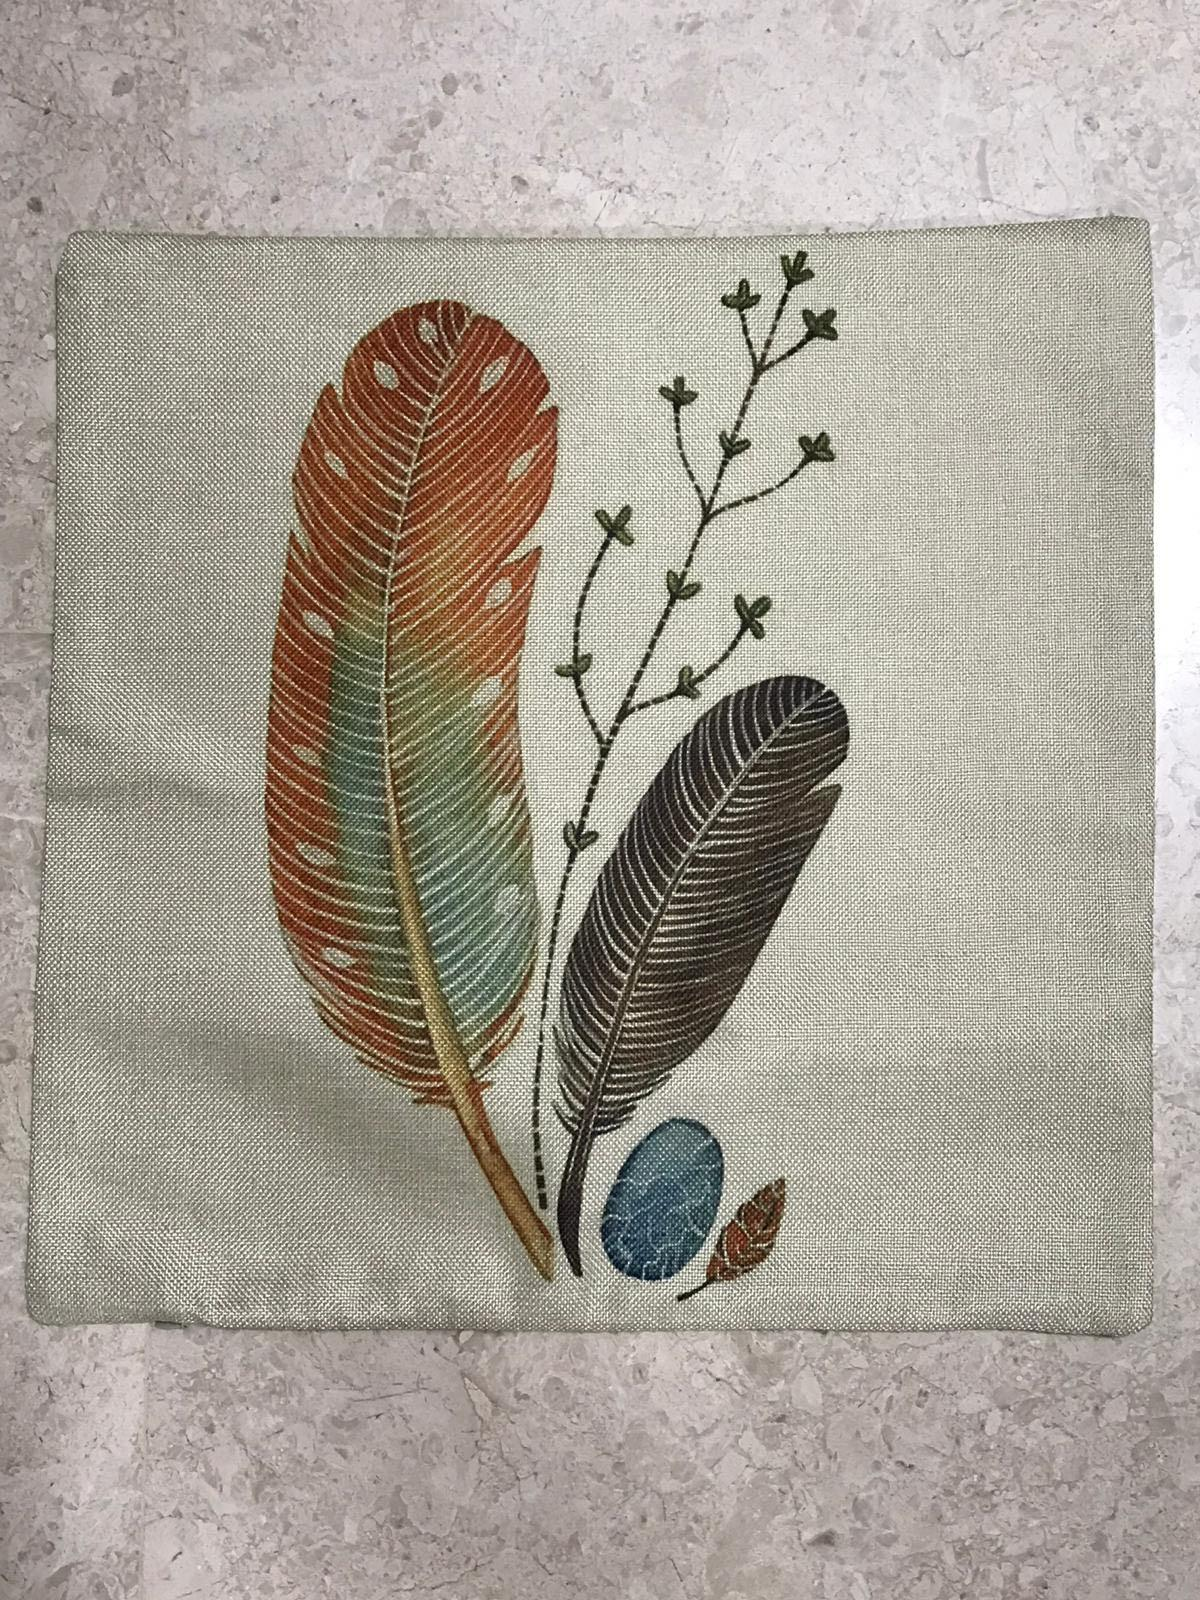 Linen Sofa Cushion Cover - Nature Series (SDJ-013)